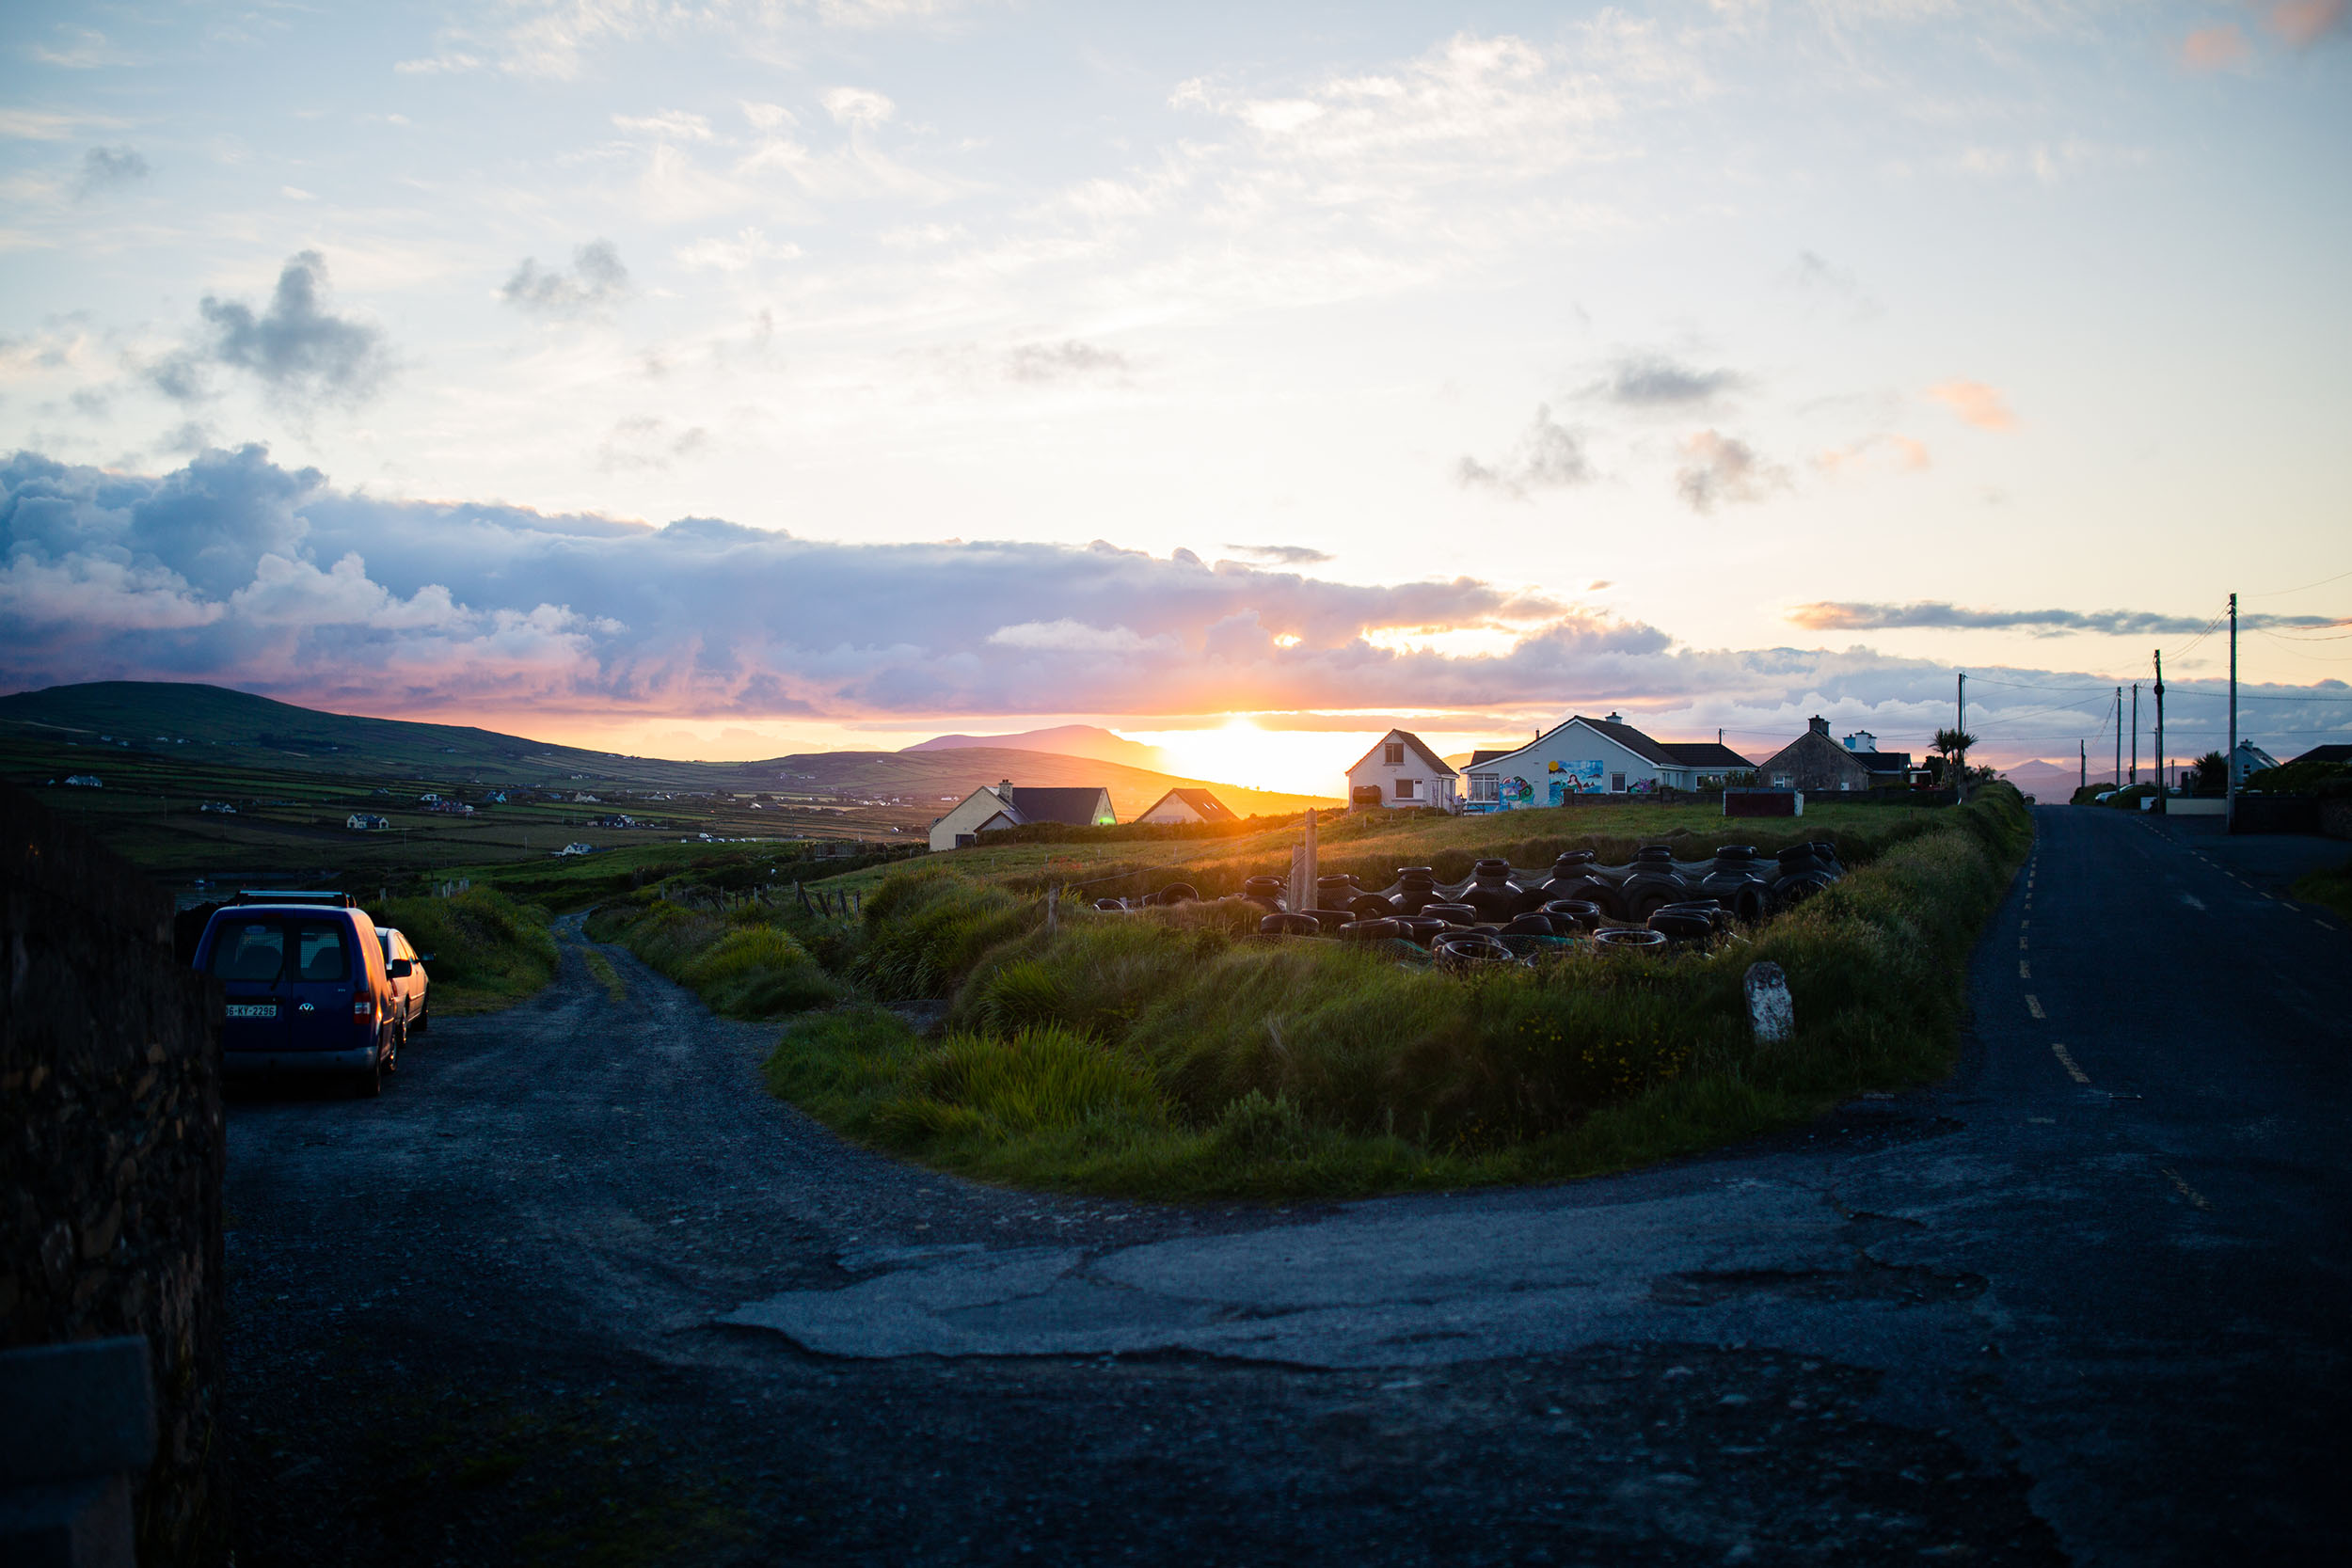 IRELAND_KERRY_PORTMAGEE_0008